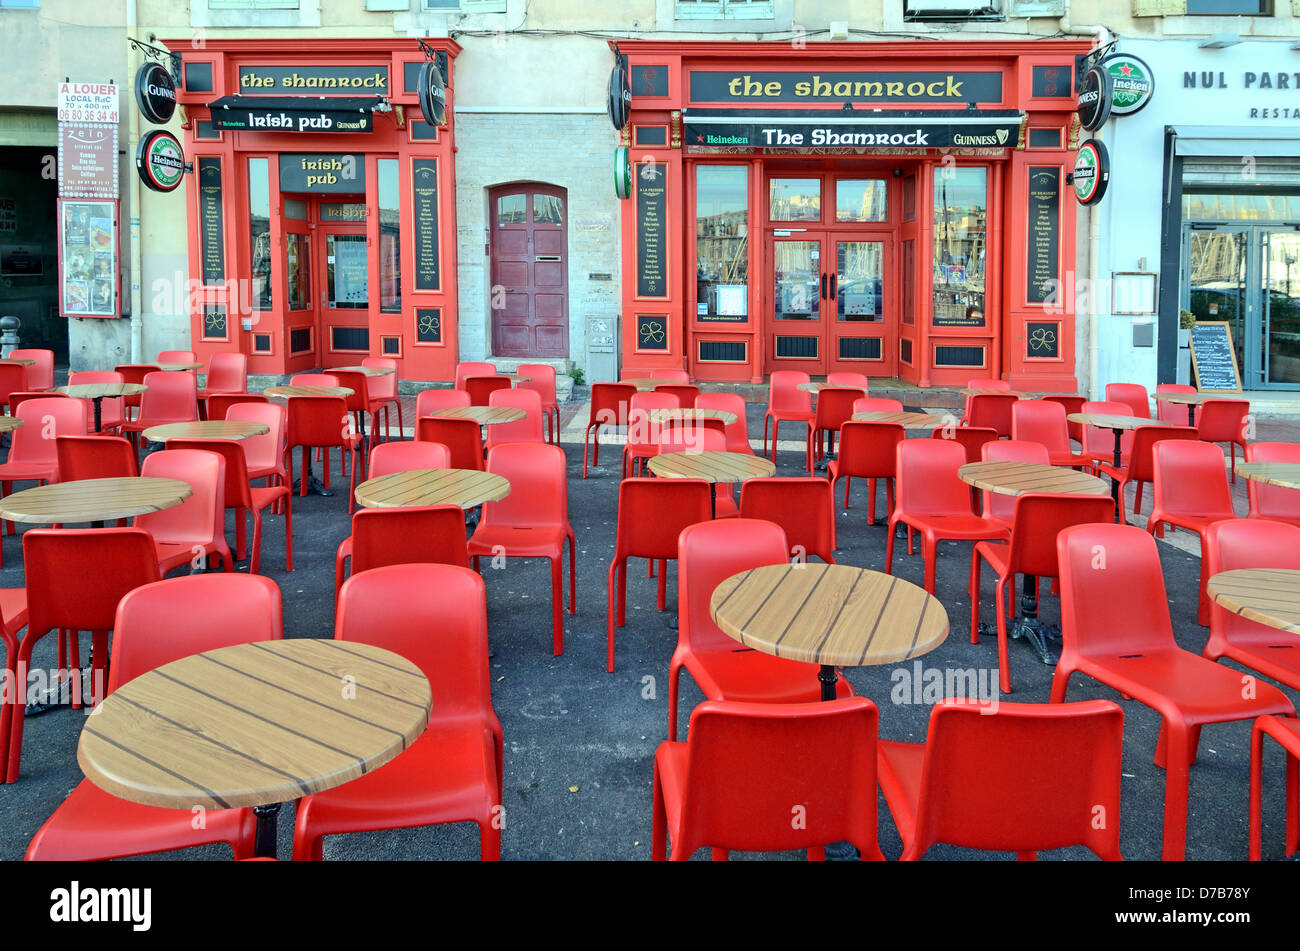 Tavoli E Sedie Heineken.Irish Pub Bar O Caffetteria Sul Marciapiede Con Tavoli E Plastica